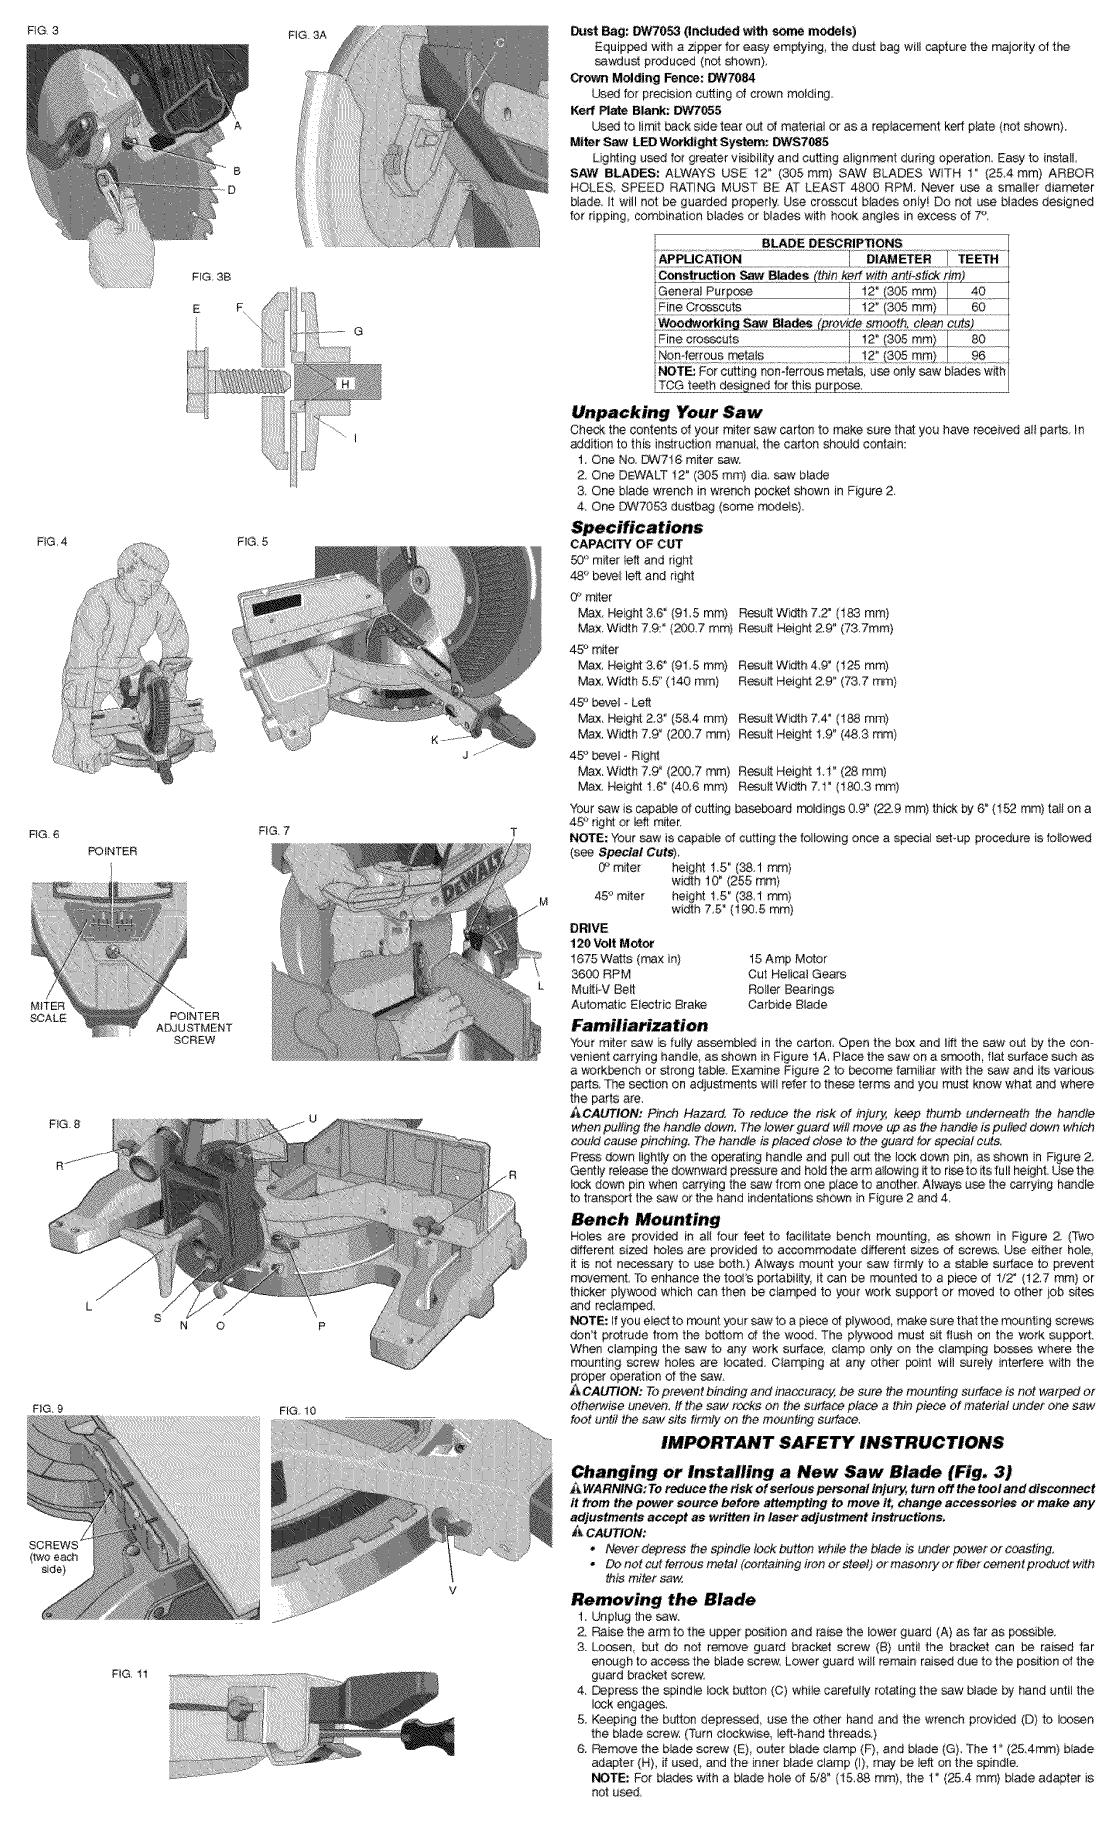 Dewalt DW716 TYPE3 User Manual MITER SAW Manuals And